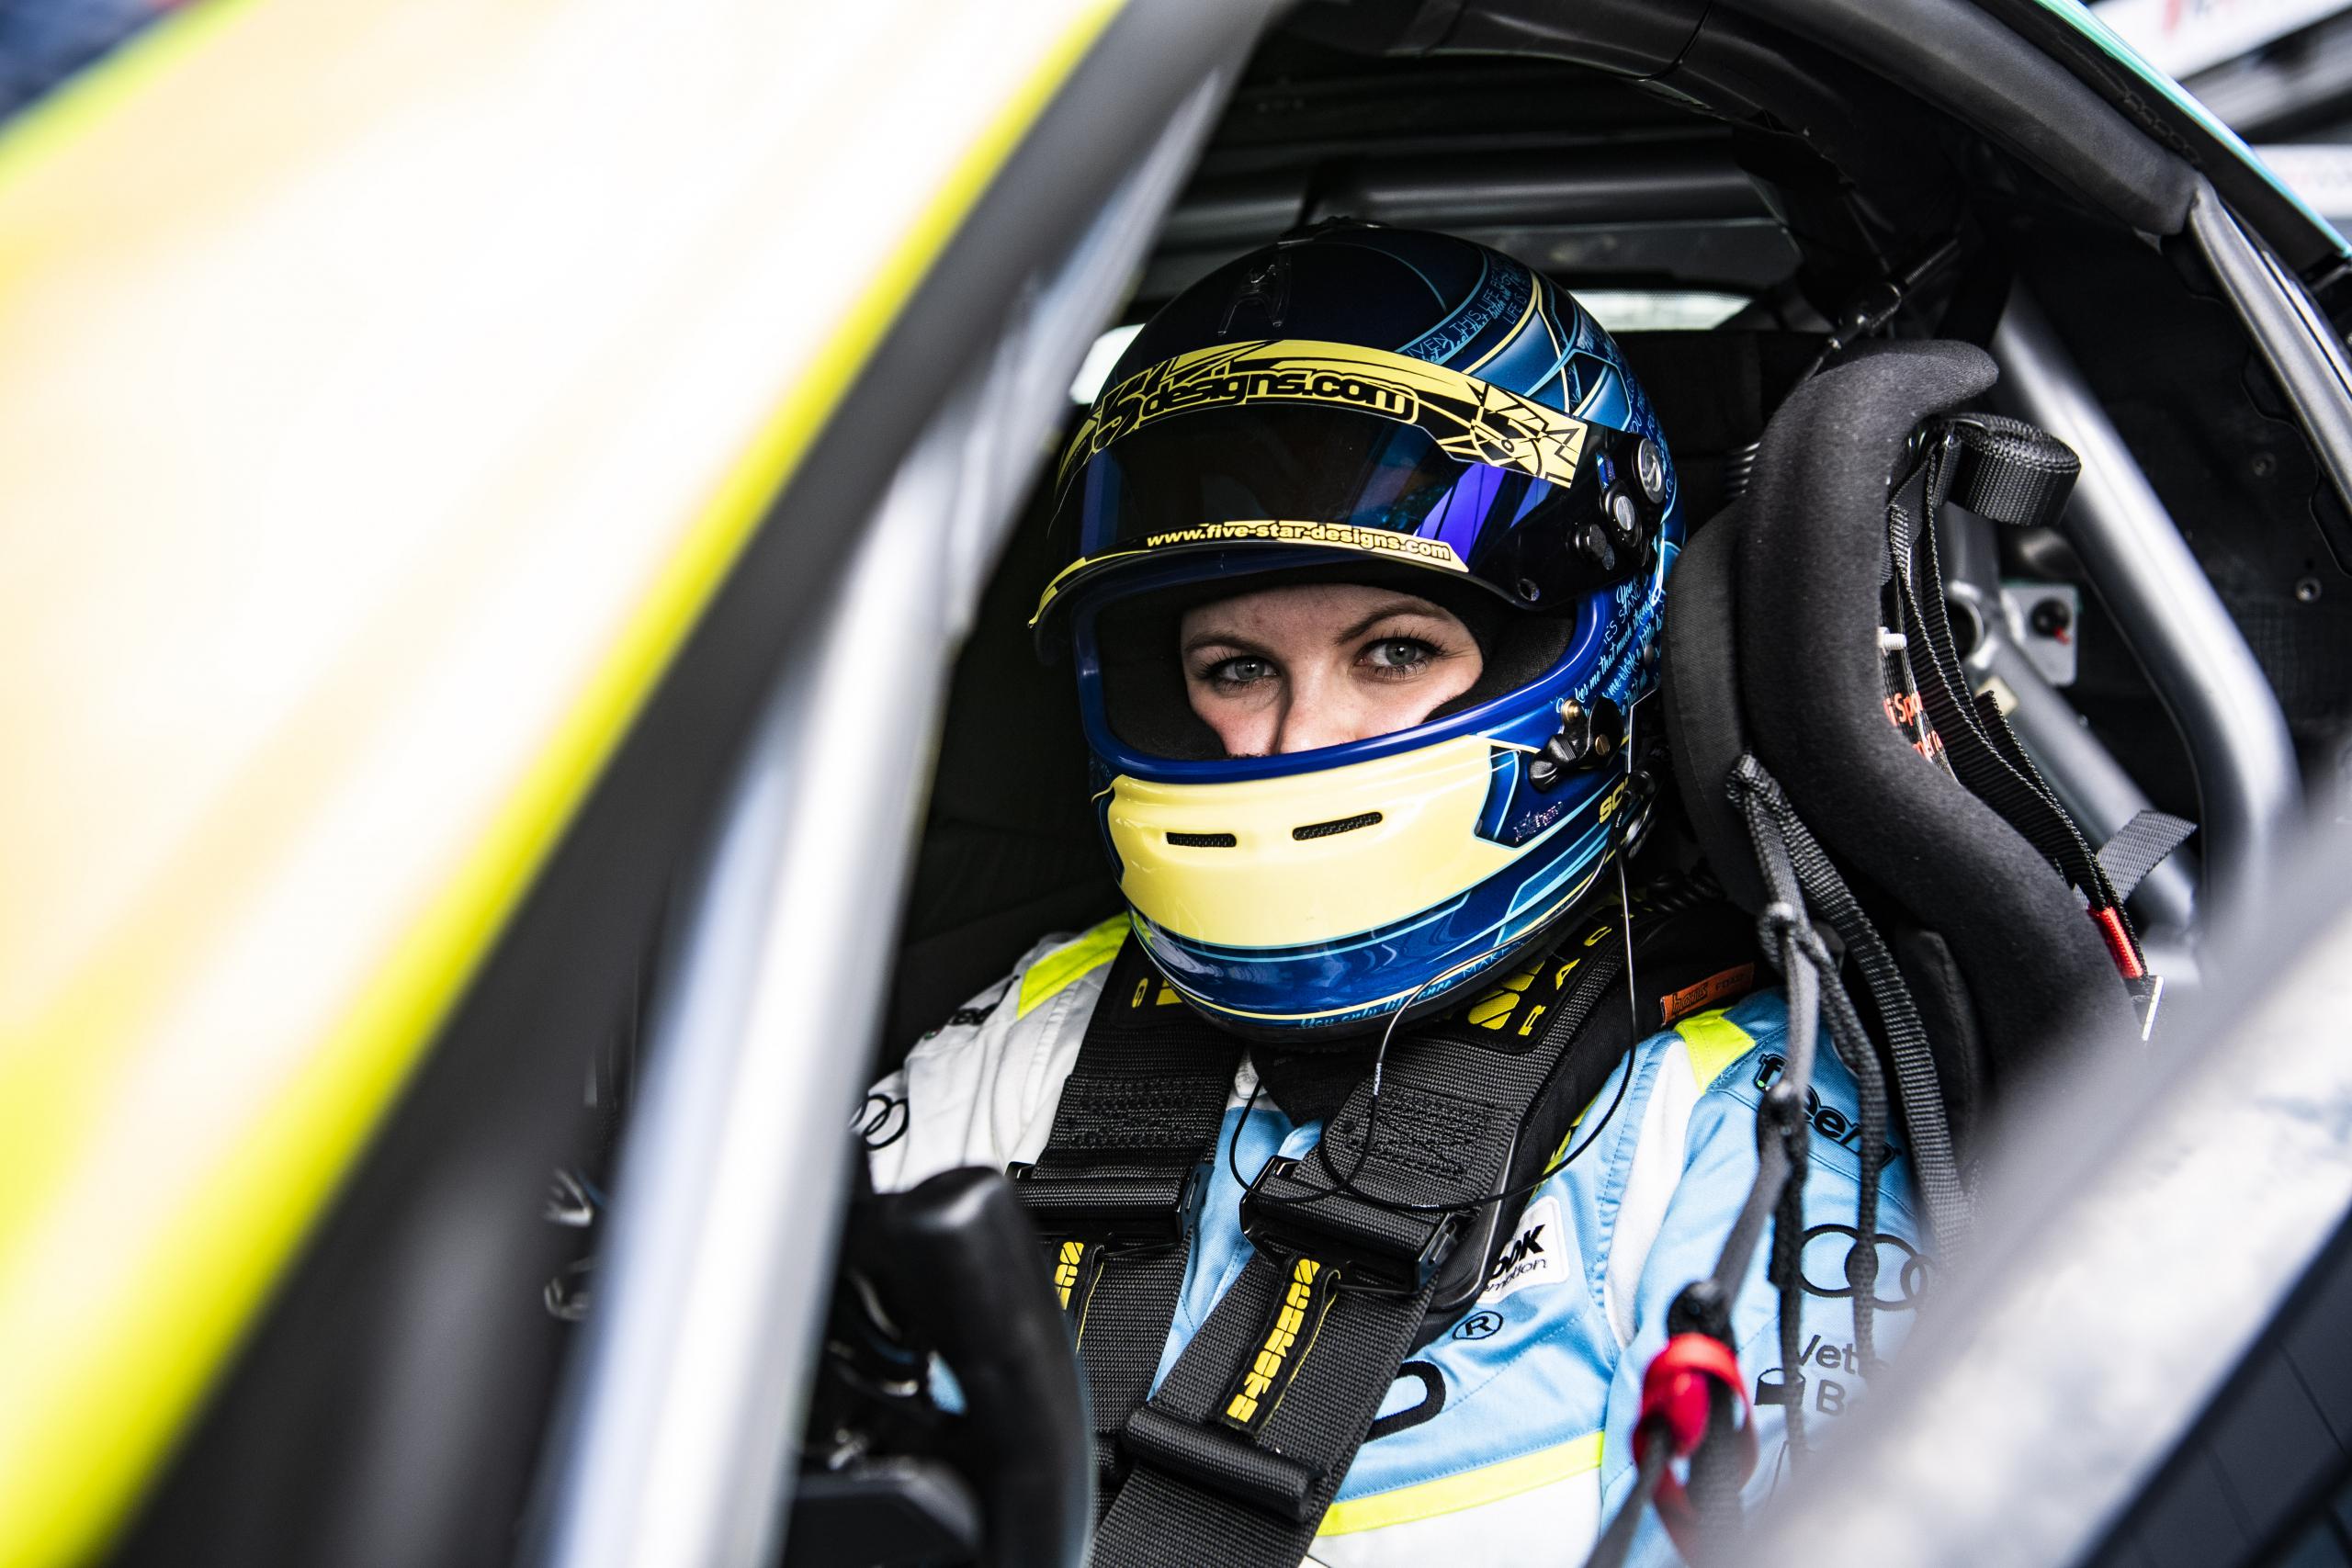 Motorsport: DTM Trophy Lausitzring  on Juny, 23, 2021, (Photo by Malte Christians)